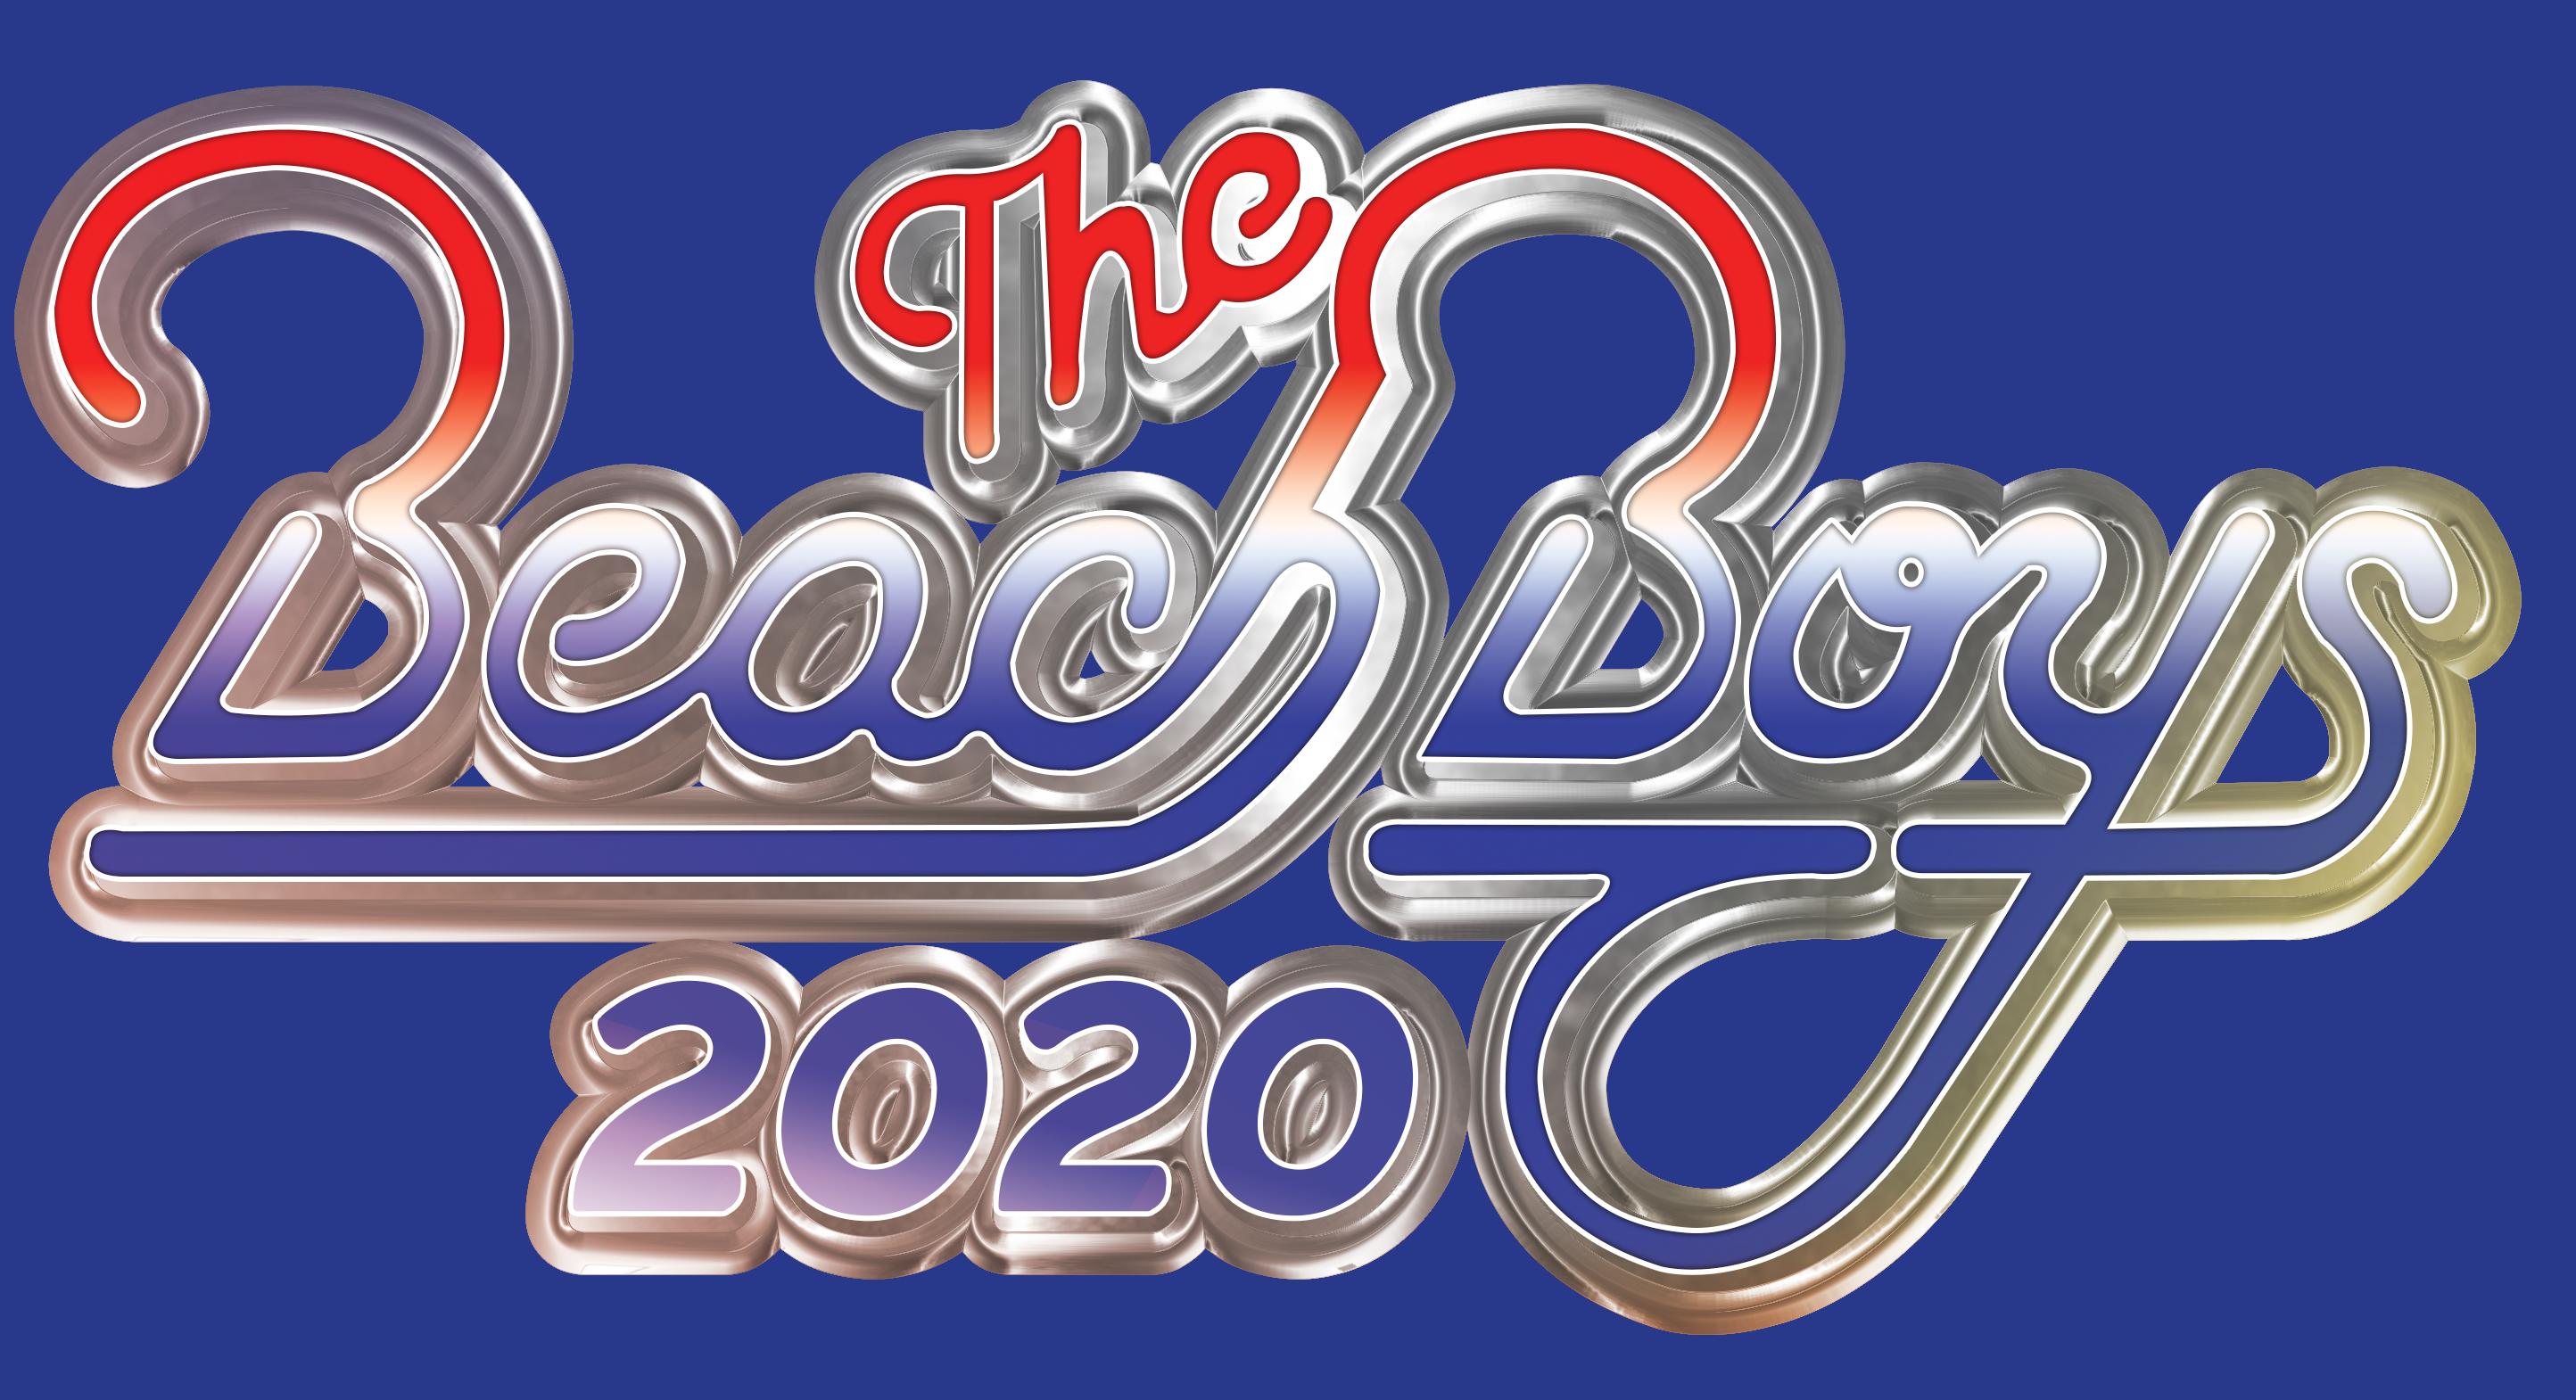 11/8: The Beach Boys at AVA Amphitheater